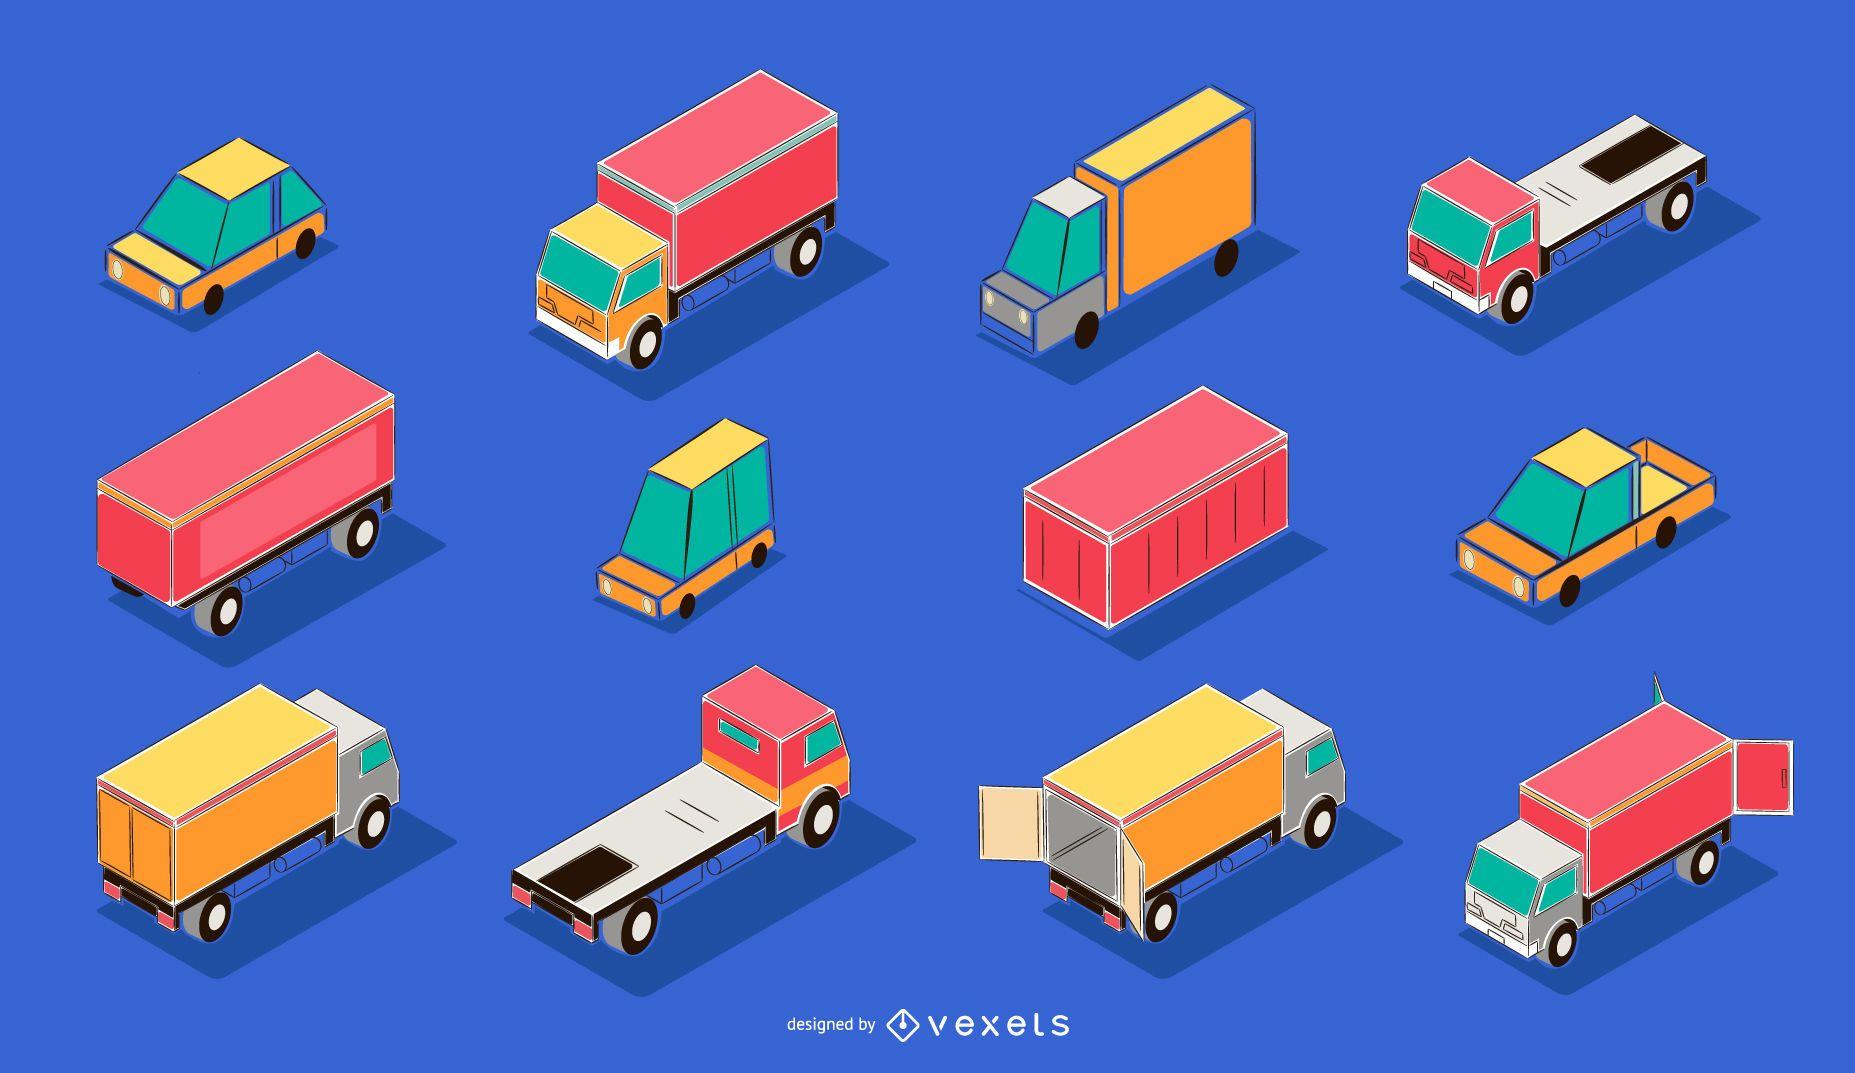 Transportation Isometric Illustration Pack